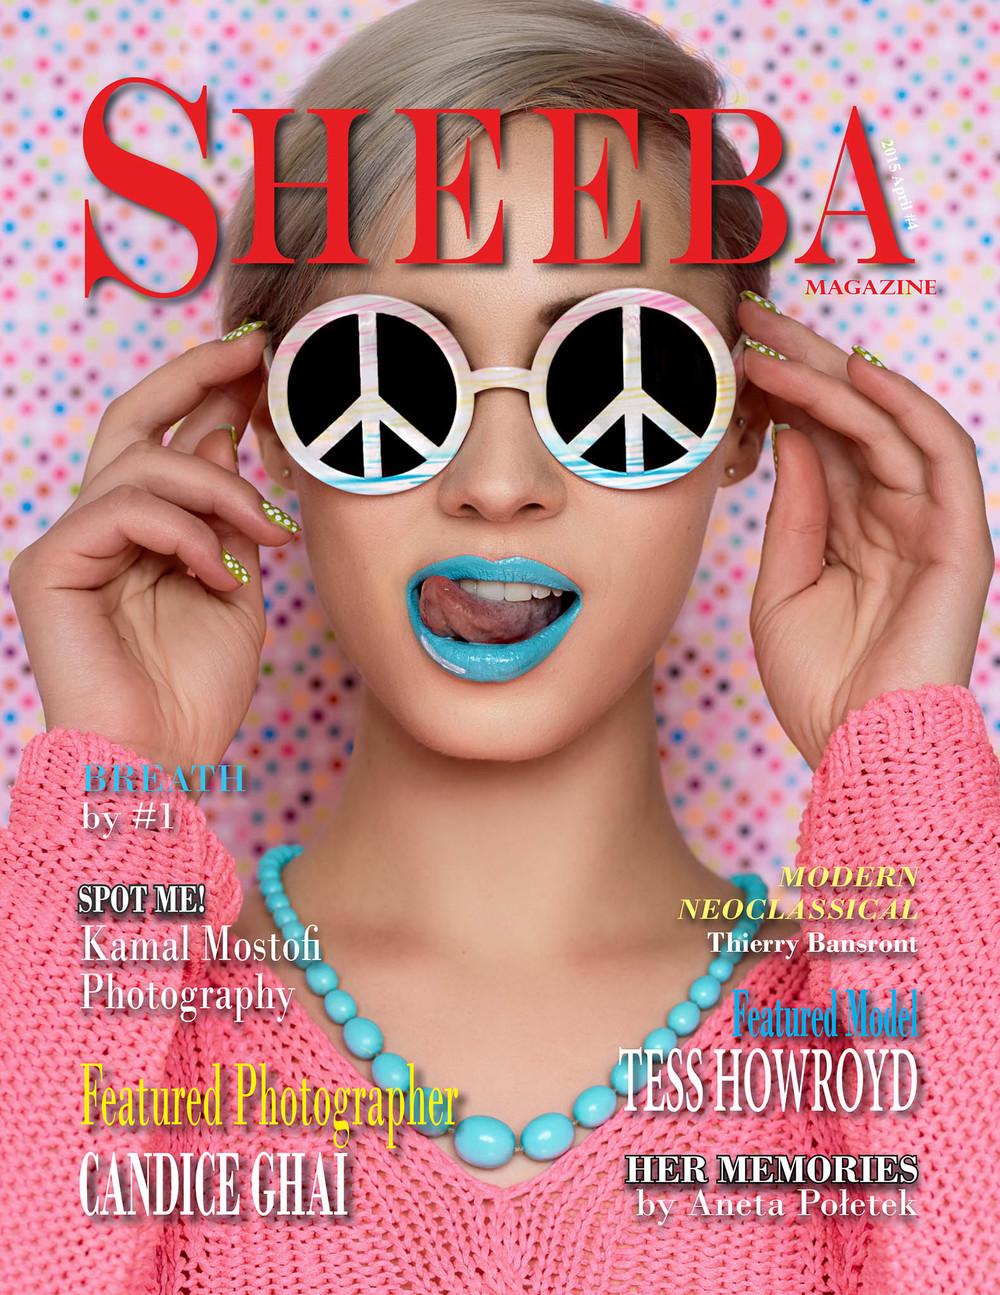 2015 #4 April COVERsmall-Kamal Mostofi-Sheeba Magazine.jpg